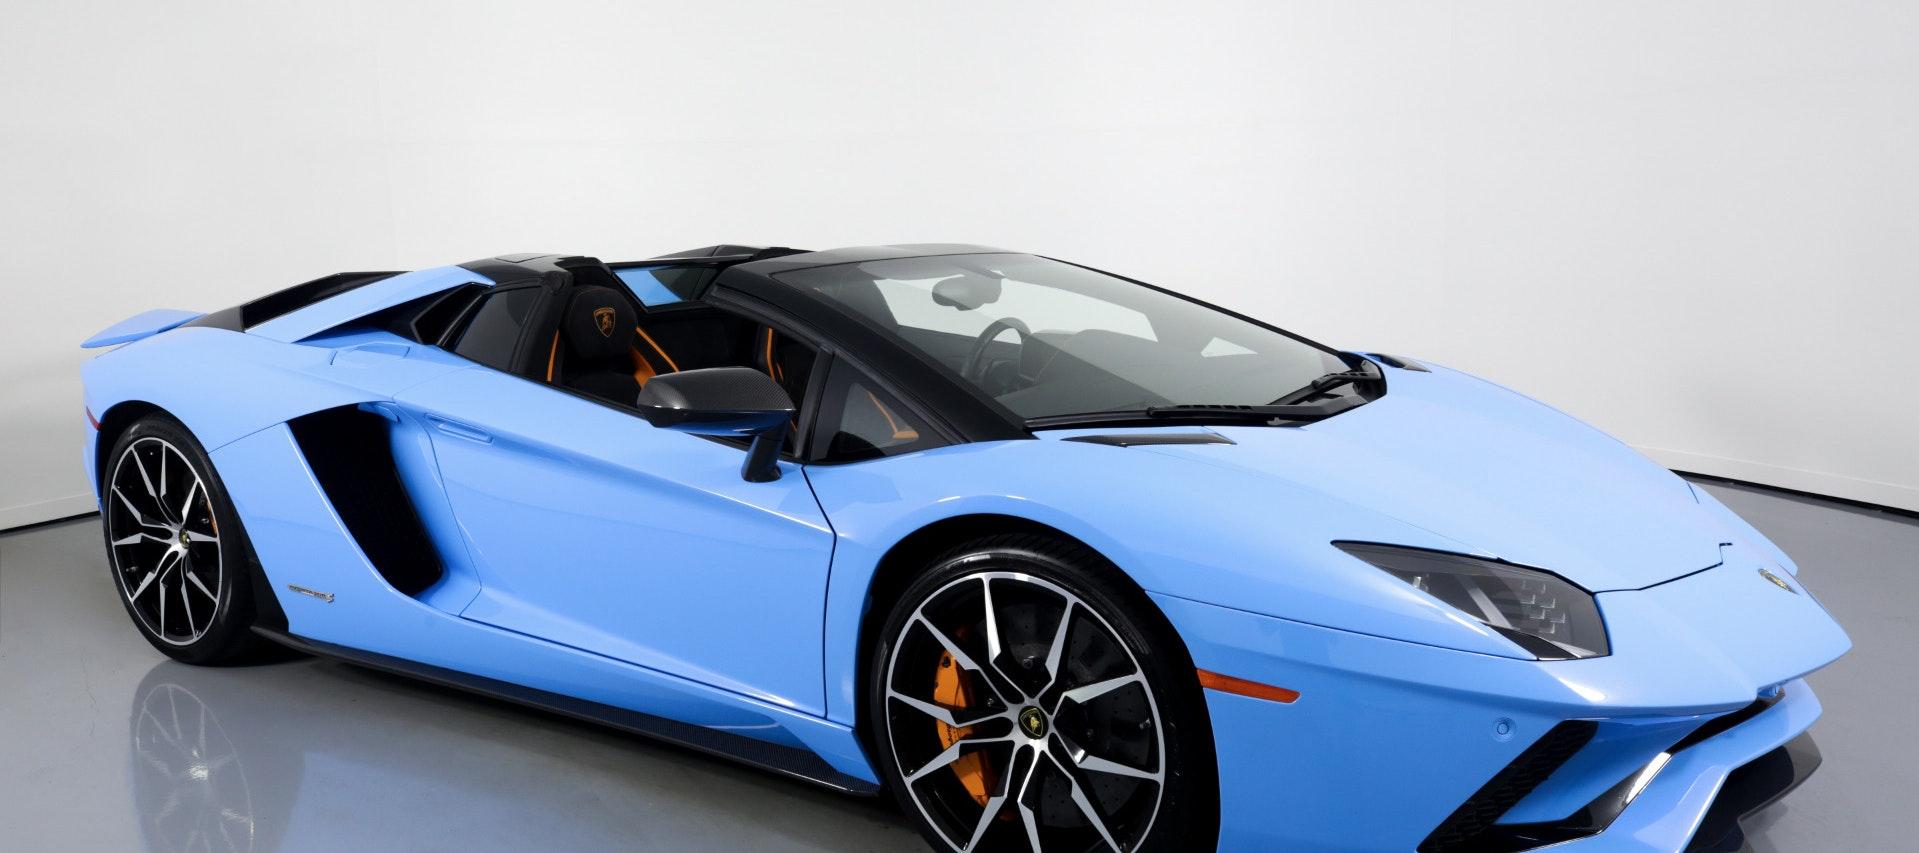 Lamborghini Aventador Spider for rent in Miami